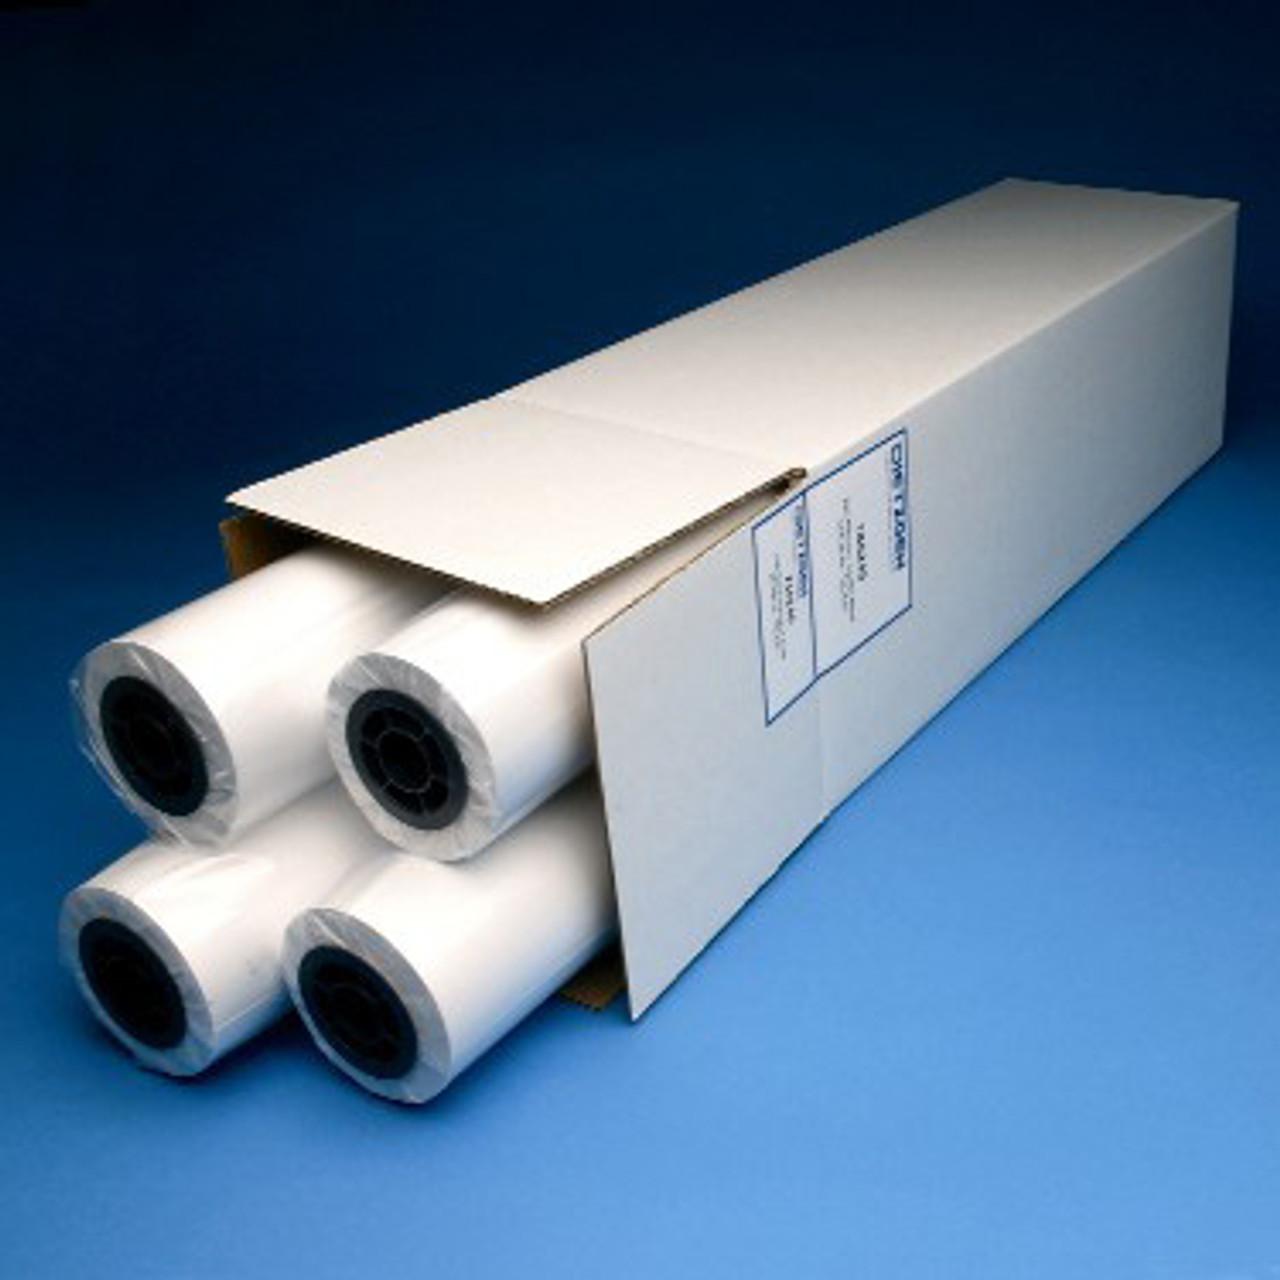 20 lb Inkjet Bond 22 x 150-4 Rolls